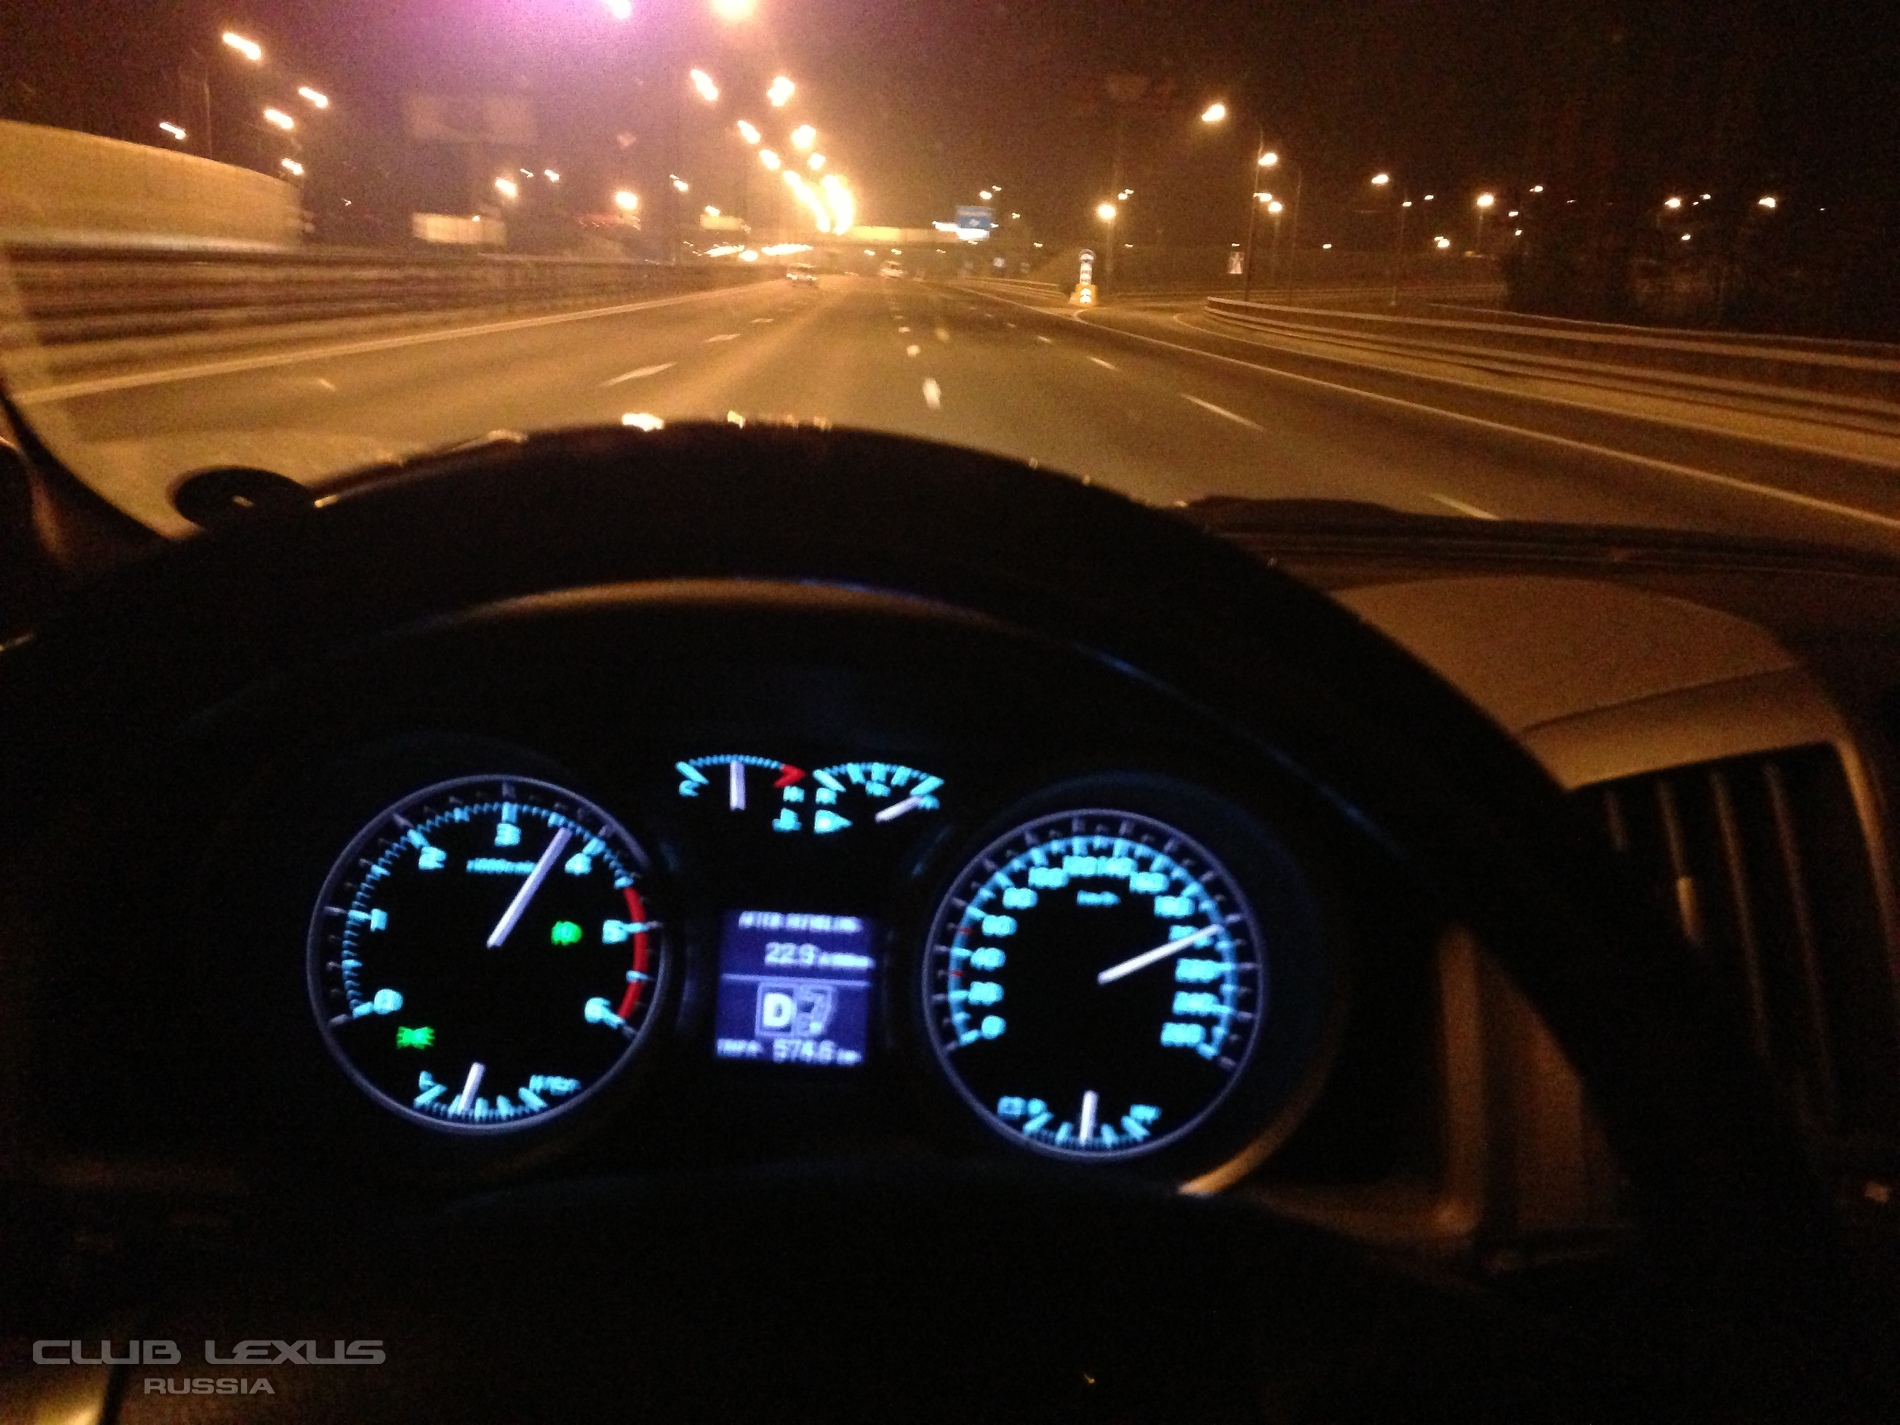 машине 200 км час на машине такой